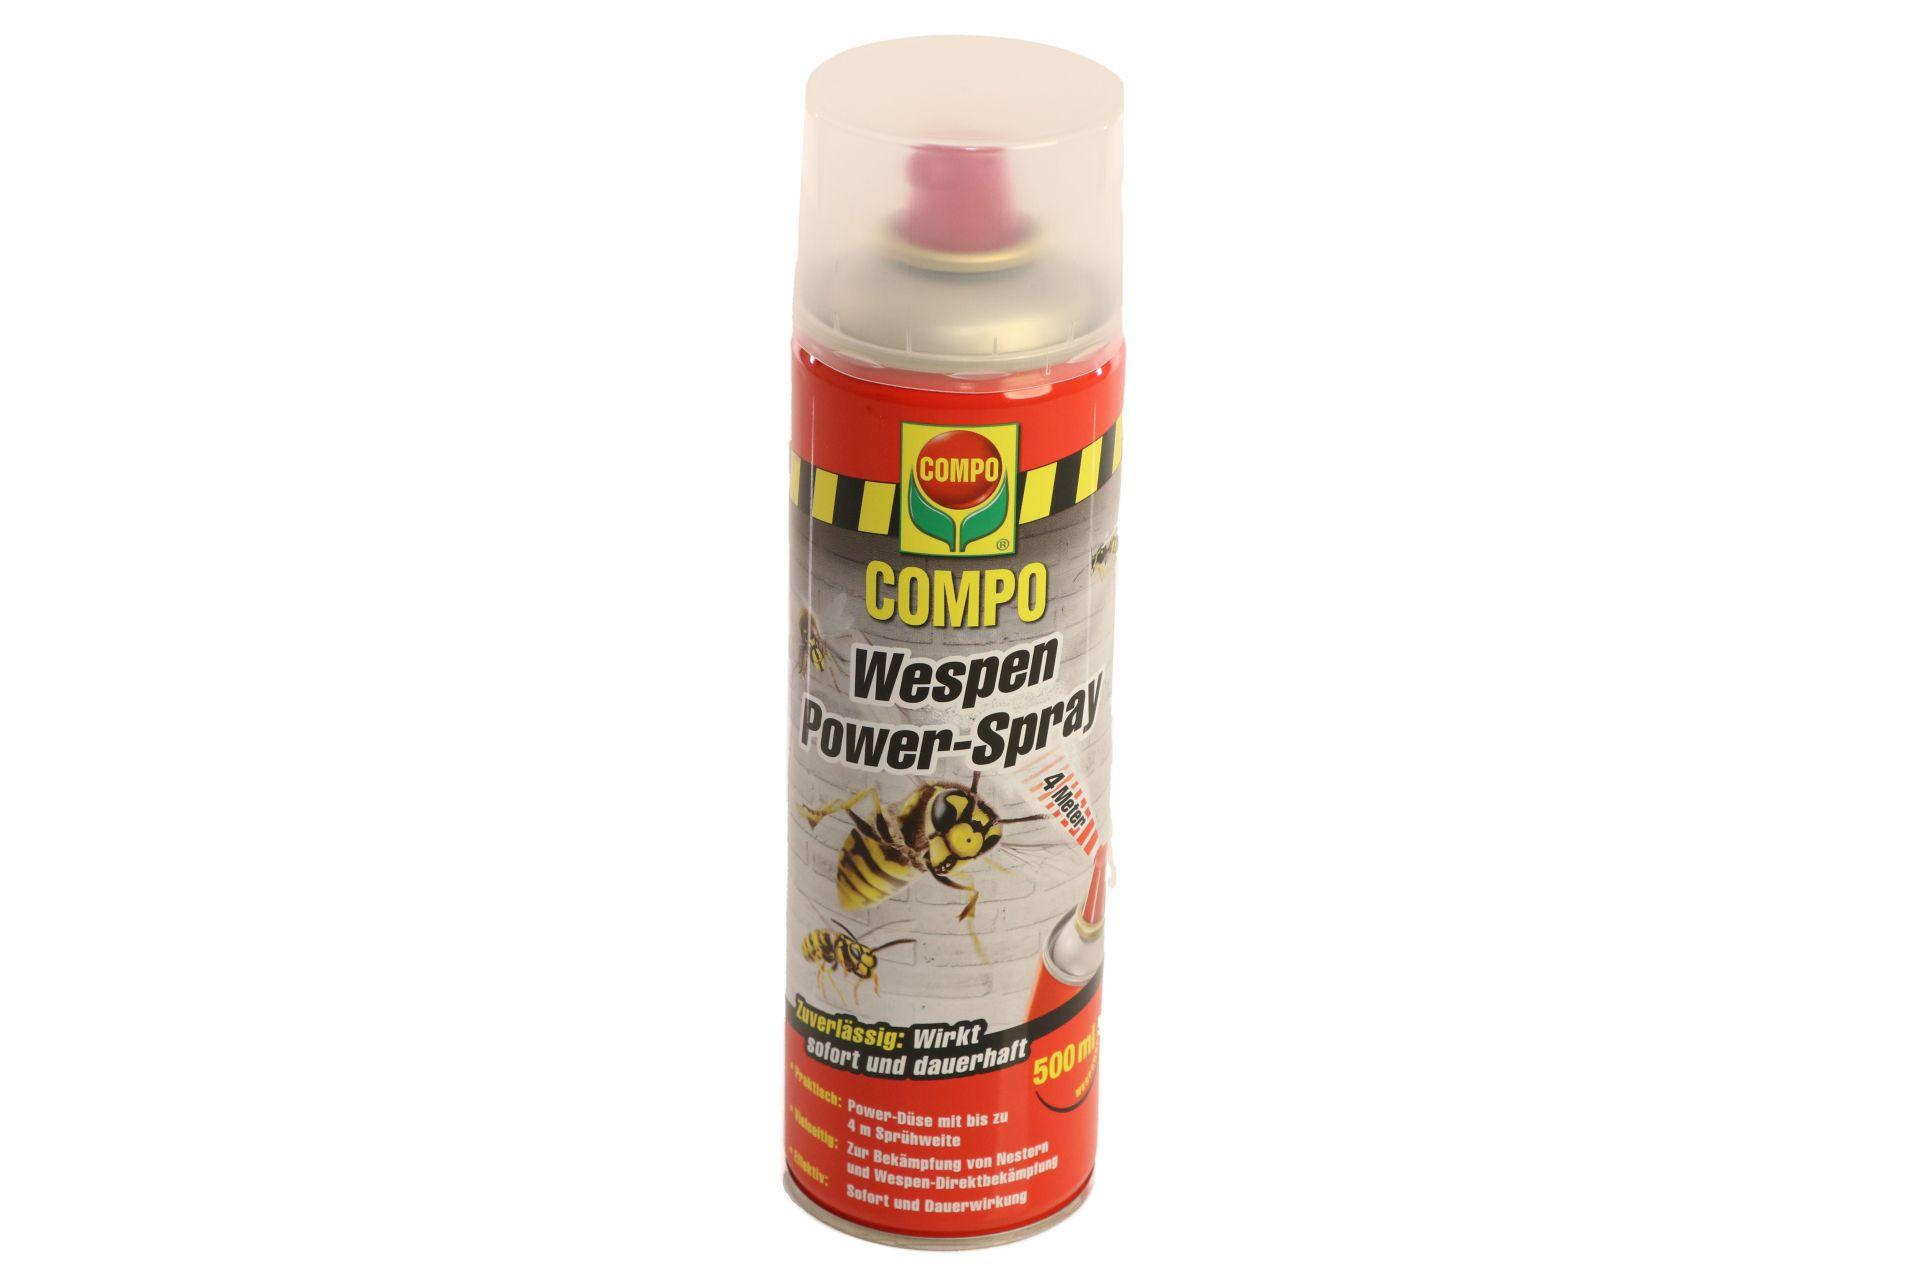 COMPO Wespen Power-Spray, 500 ml